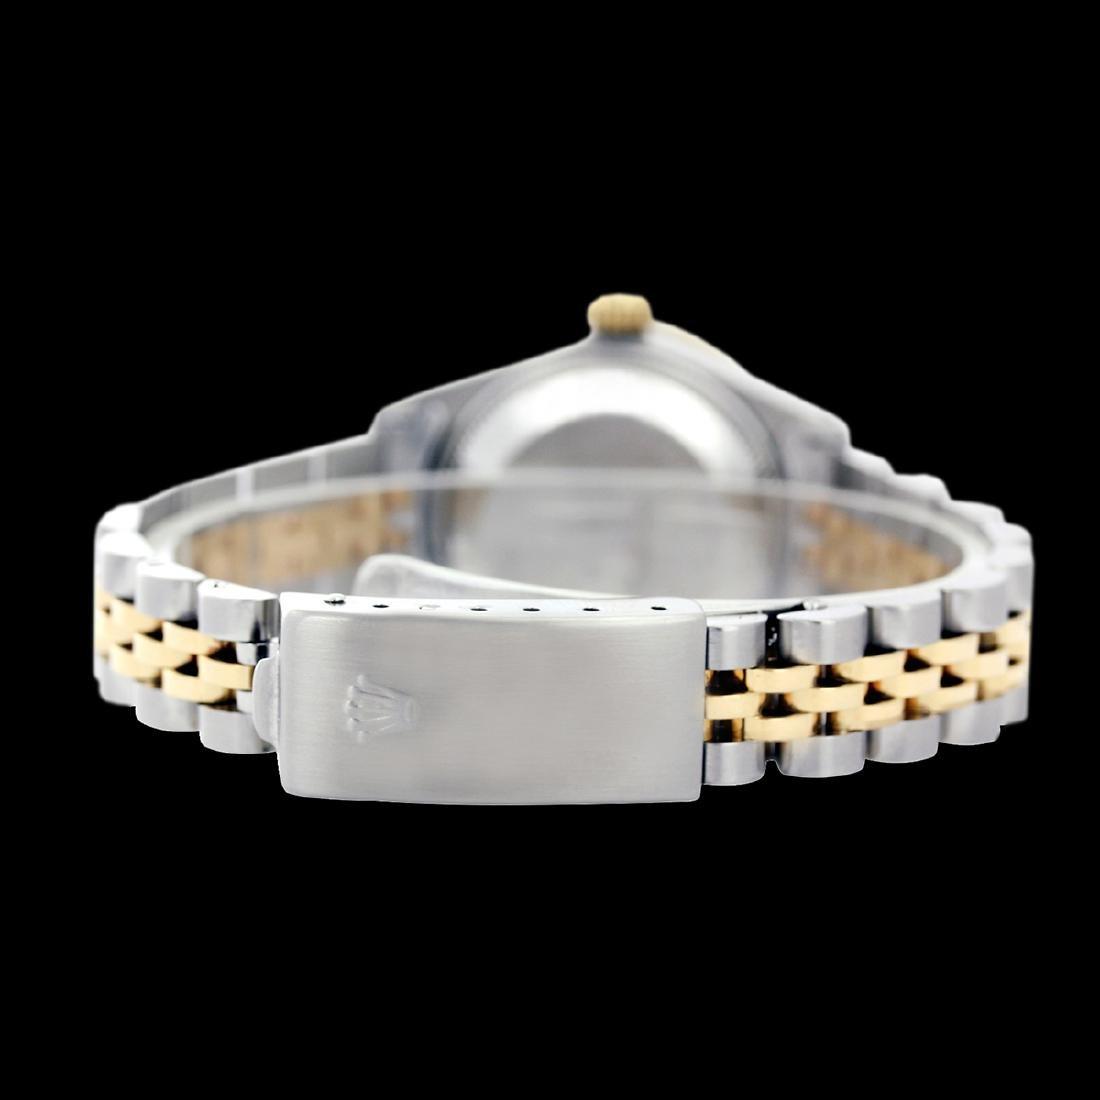 Rolex Men's Two Tone 14K Gold/SS, QuickSet, Roman Dial - 4